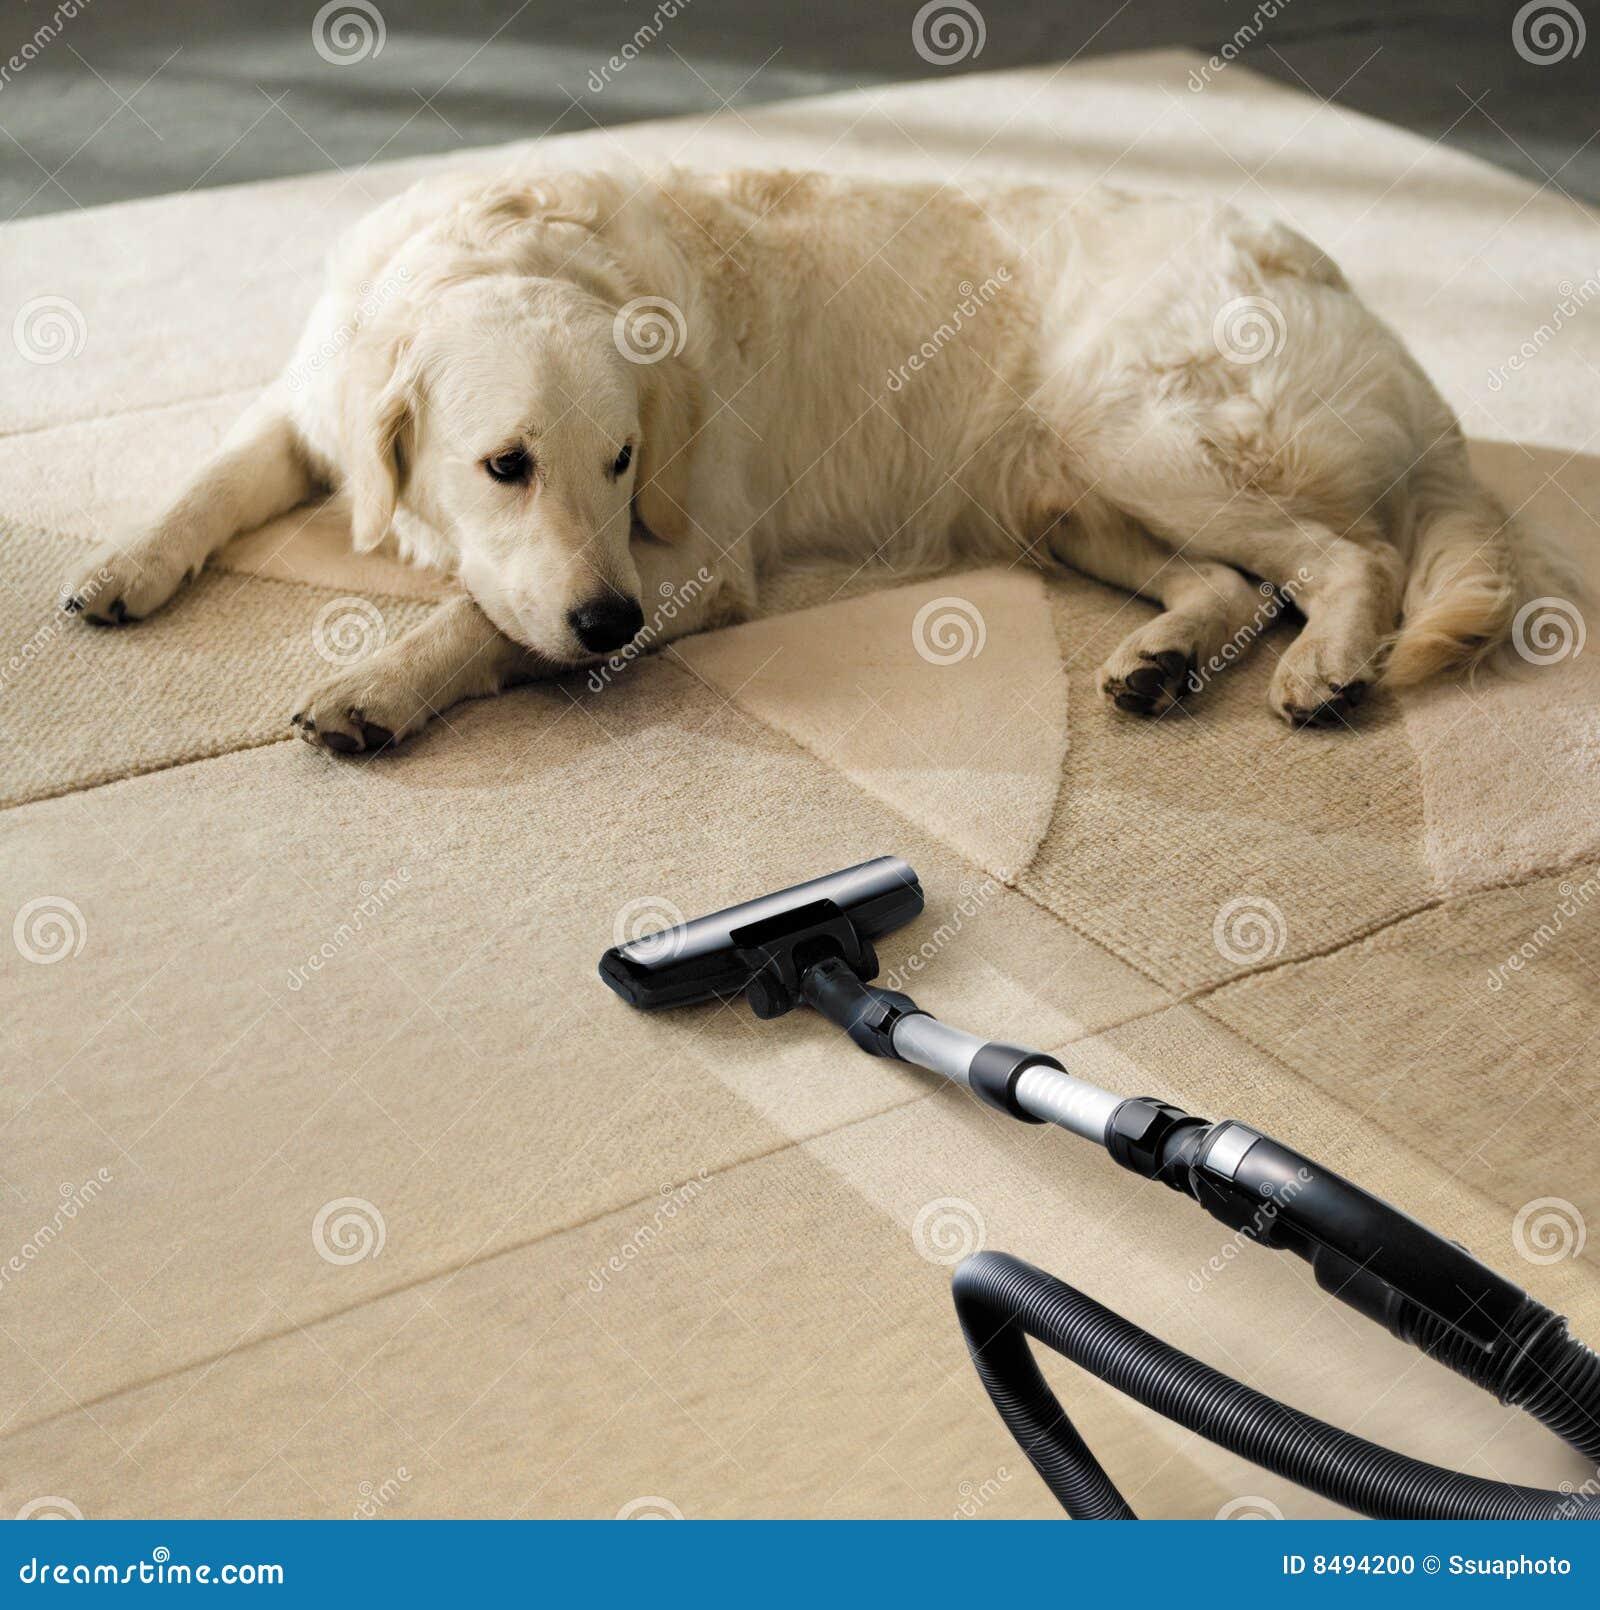 Dog Looks Like A Rug: Carpet Dog Stock Photo